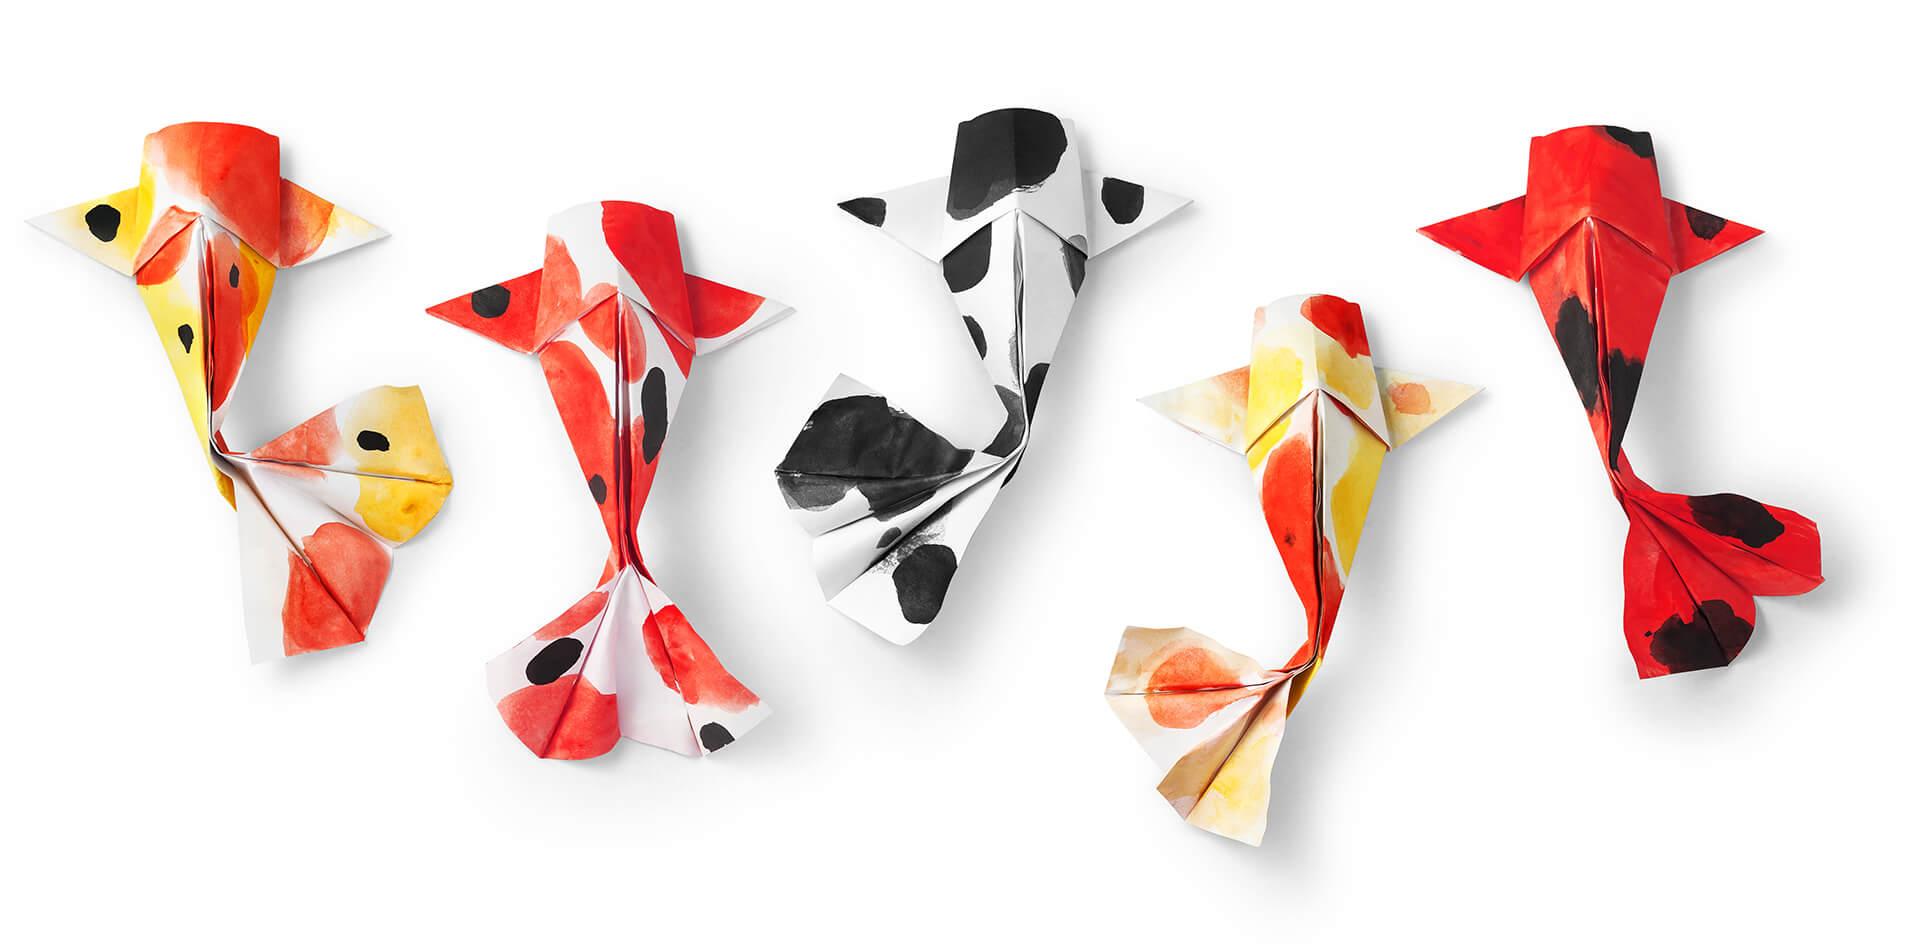 Canva_-_handmade_paper_craft_origami_koi_carp_fish_on_white_background